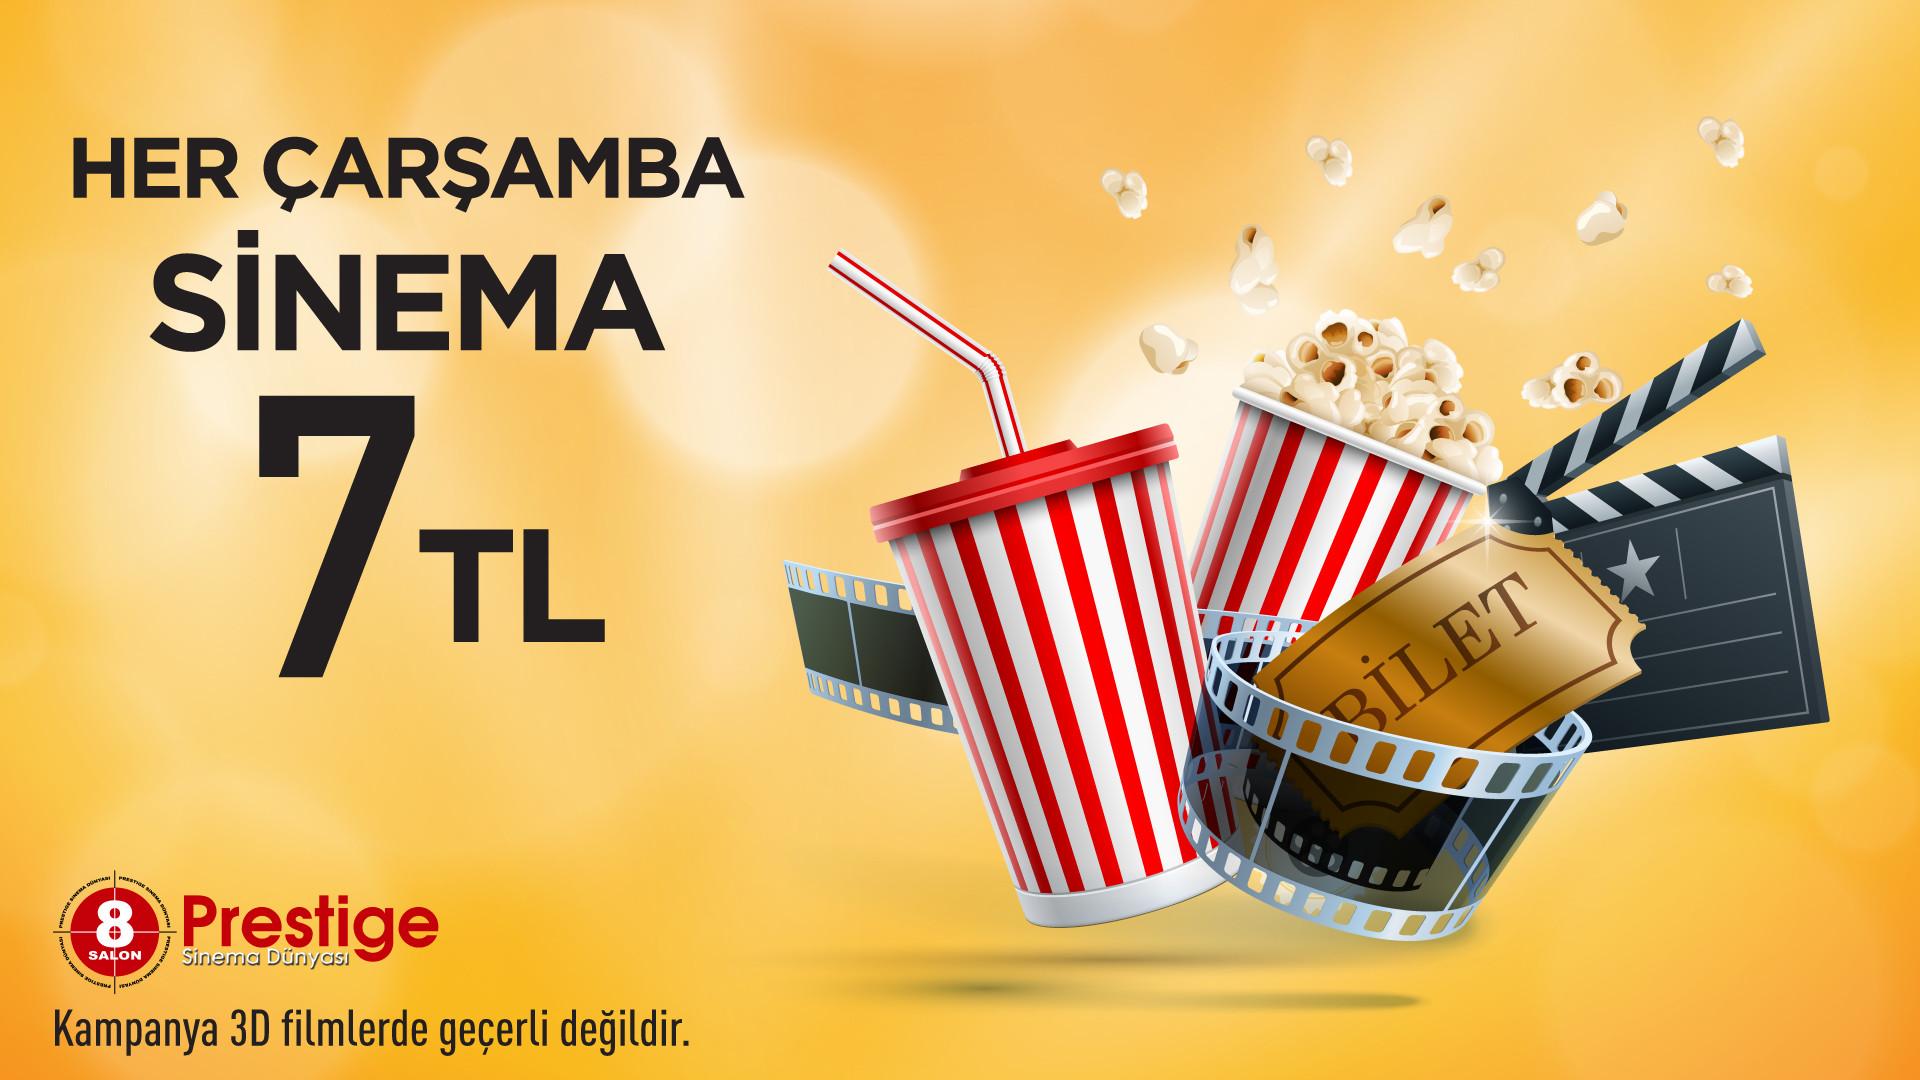 Her Çarşamba Sinema 7 TL